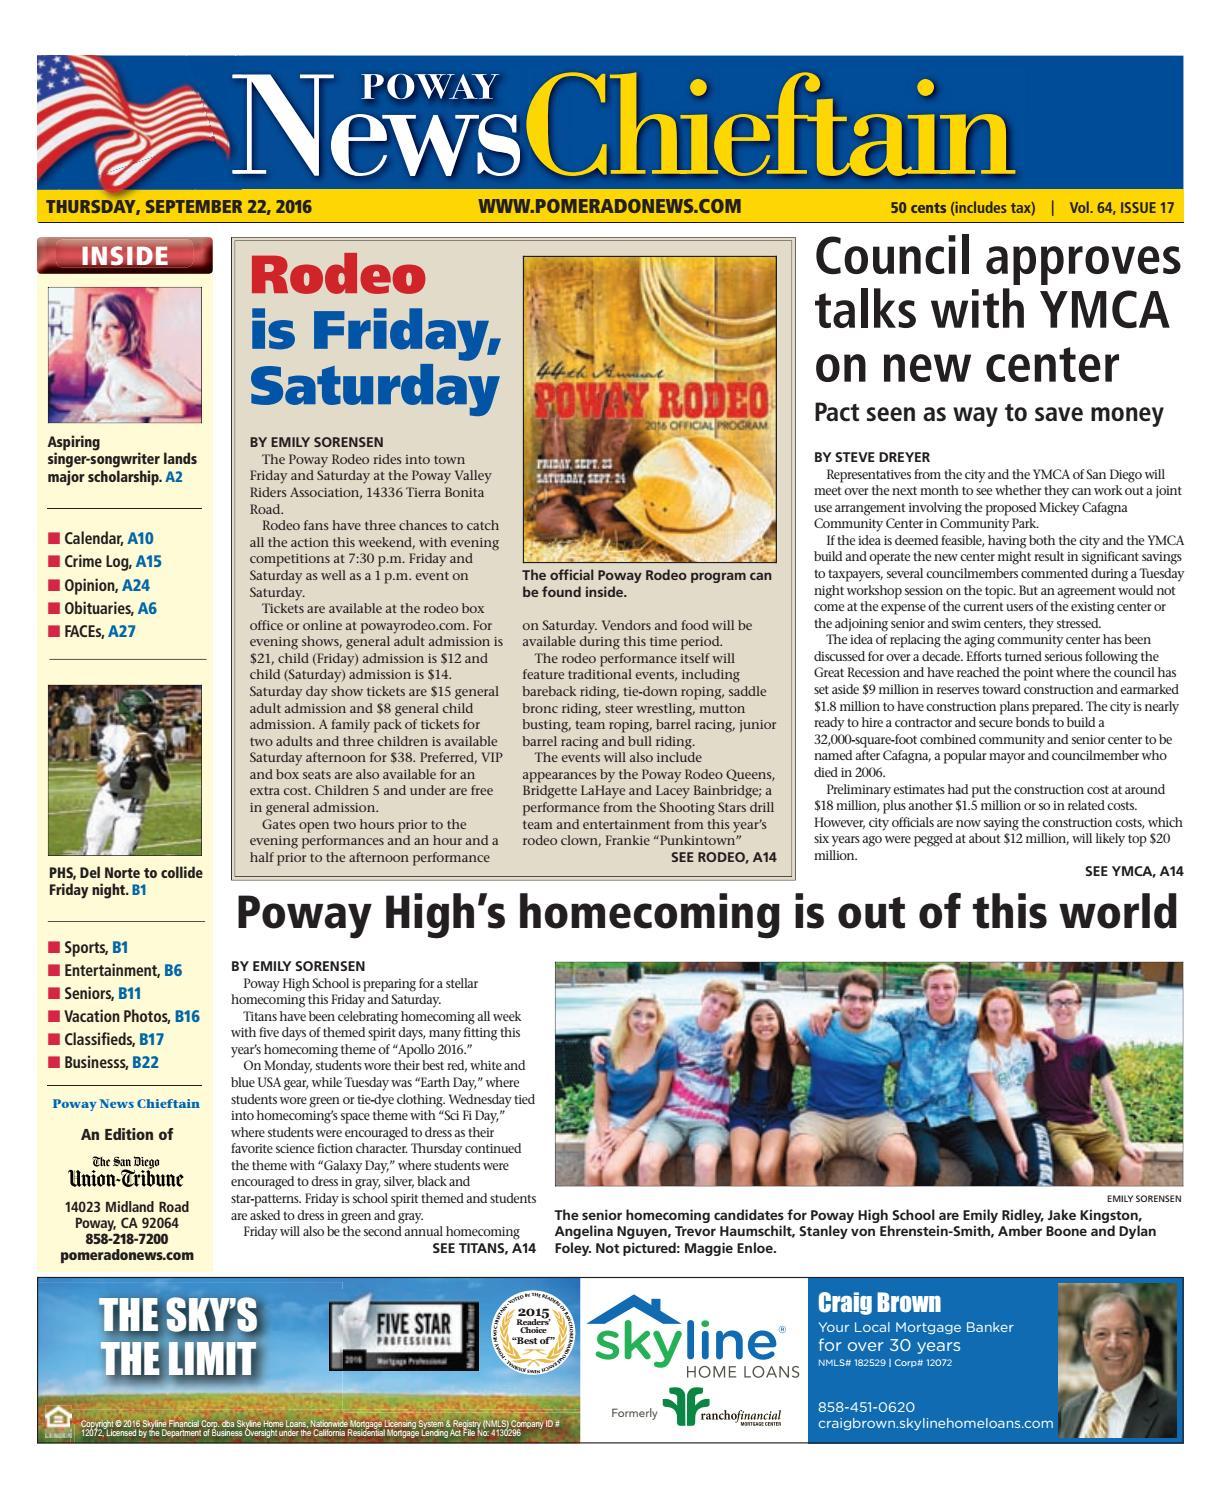 Poway news chieftain 09 22 16 by MainStreet Media - issuu